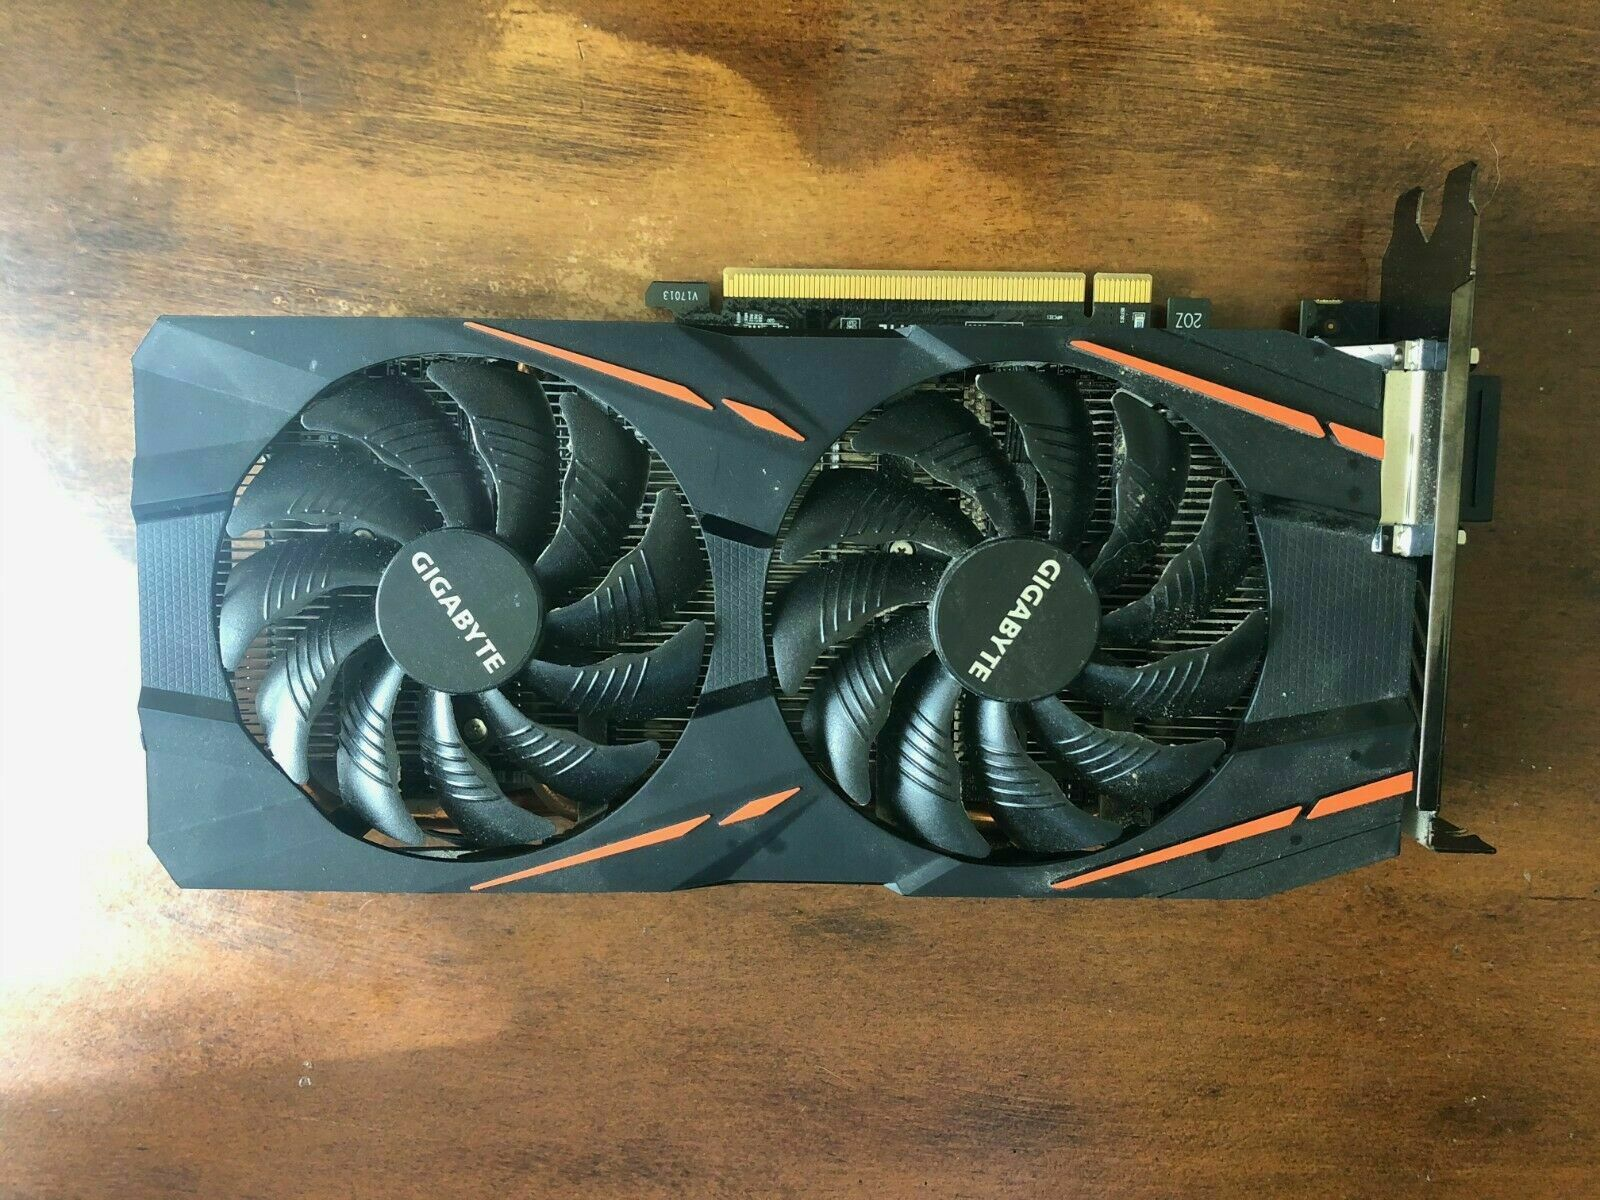 GIGABYTE Radeon RX 580 8GB GDDR5 Graphics Card (GVRX580GAMING8GD)( no box )